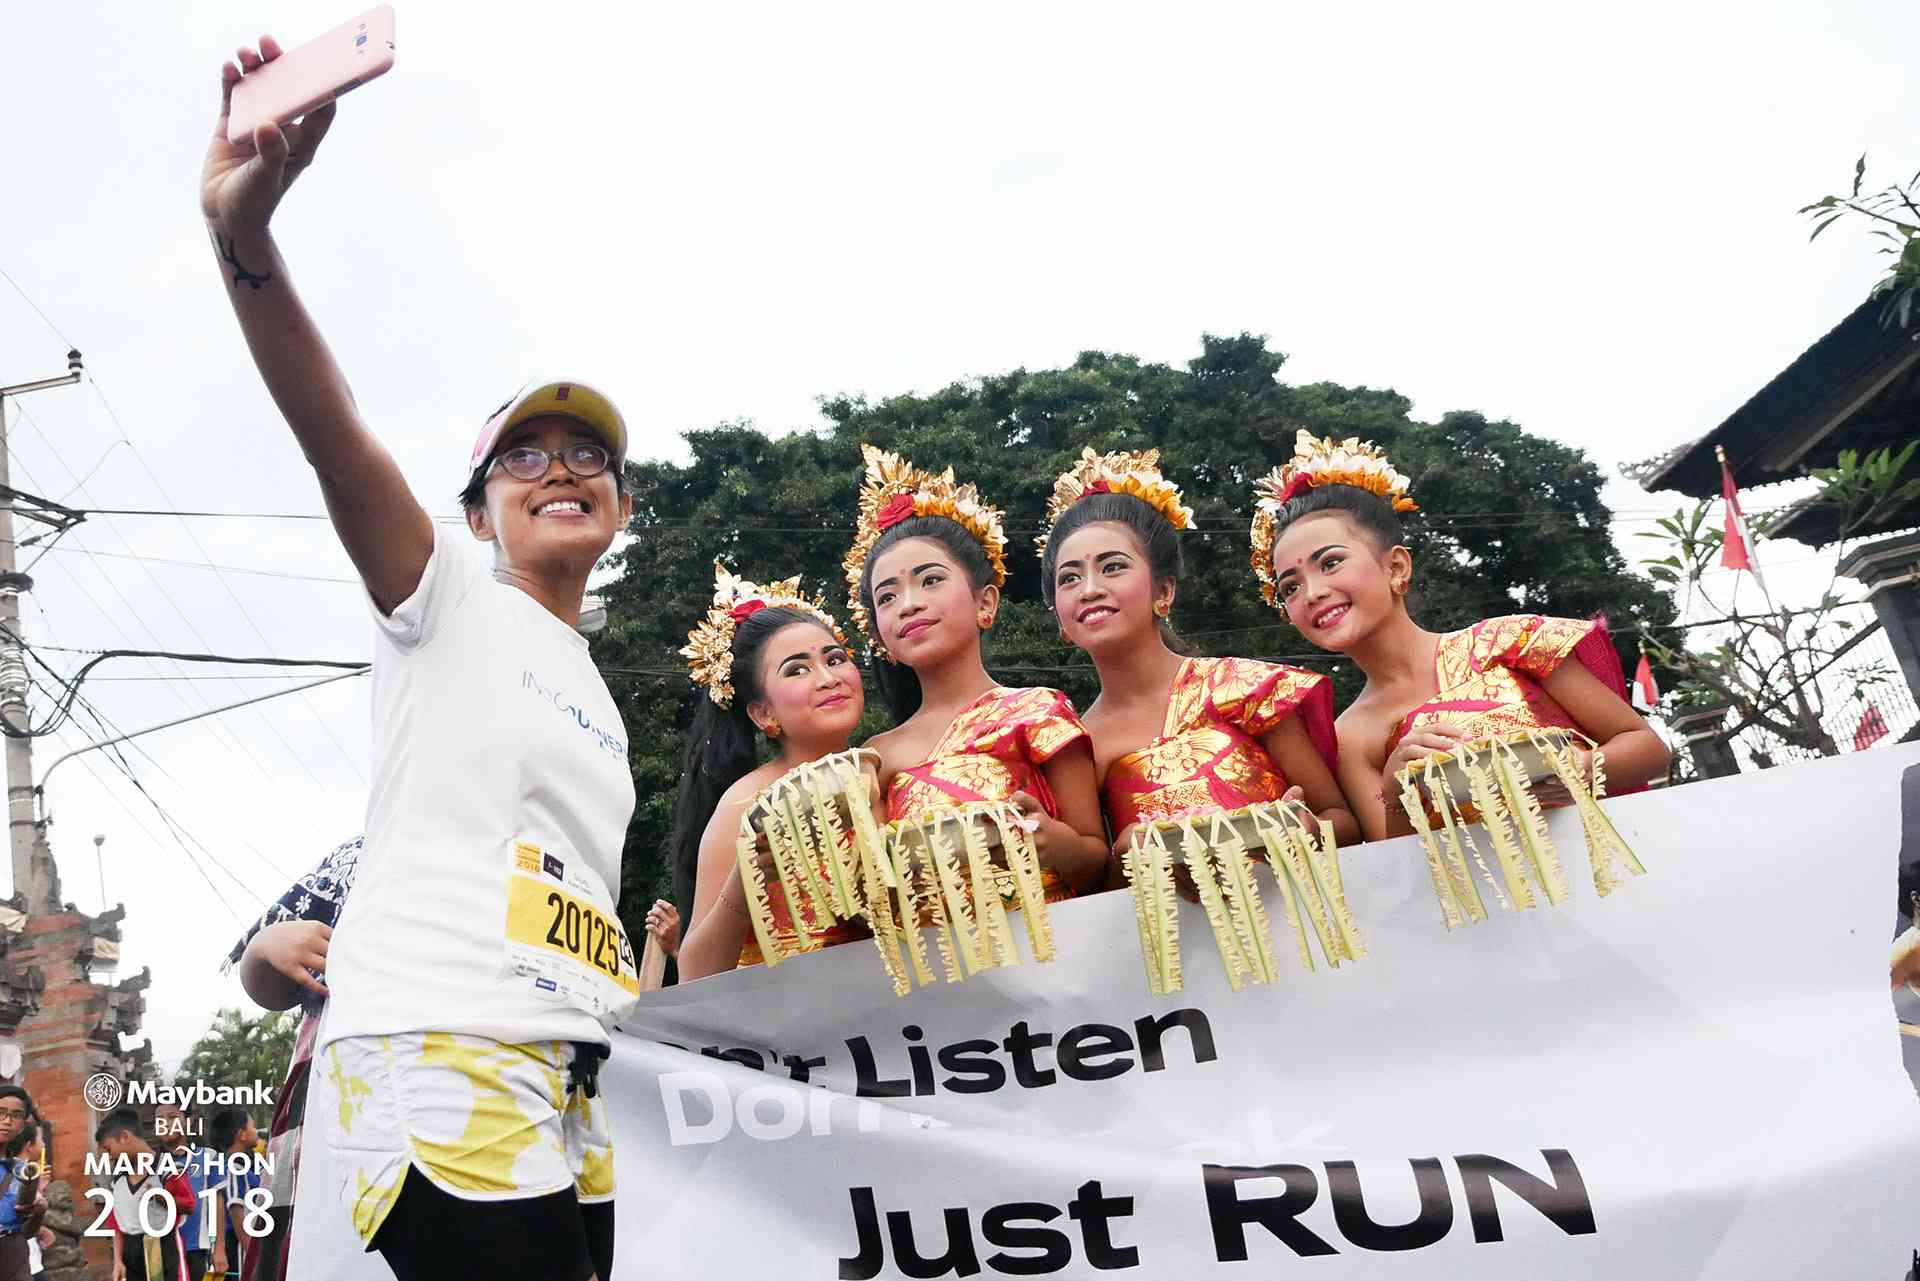 Marathon runner selfie-ing with Balinese dancers